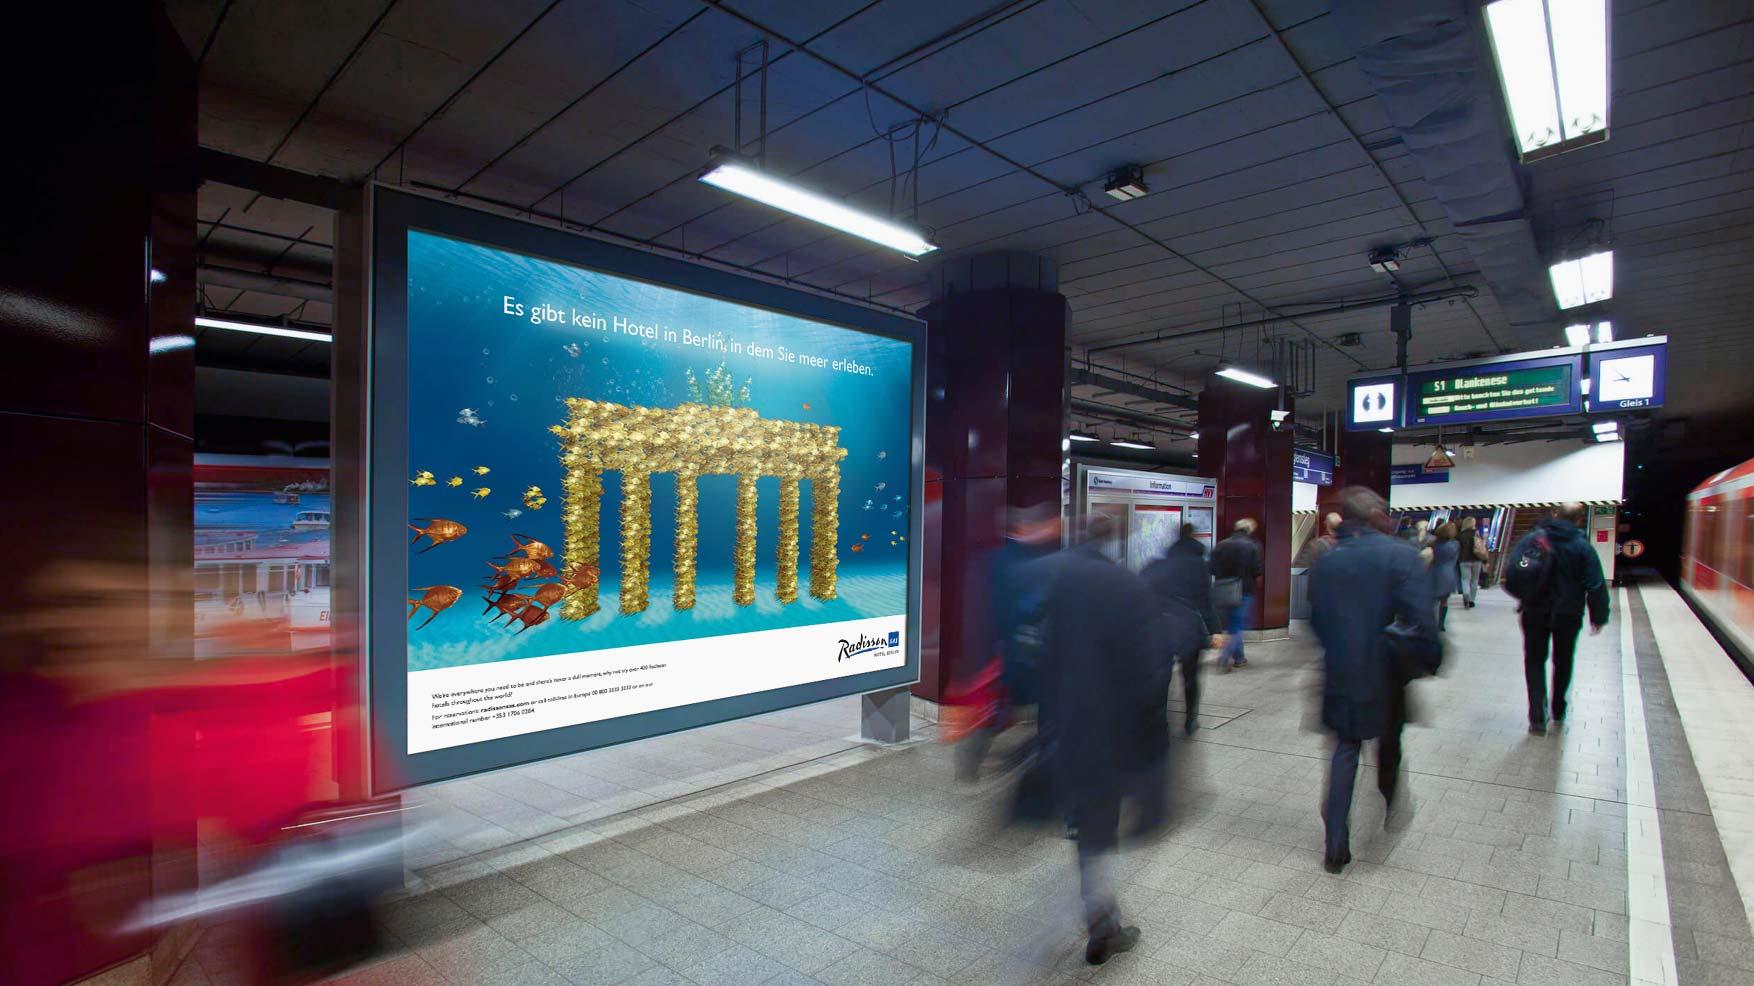 Radisson Berlin Eröffnung Plakat